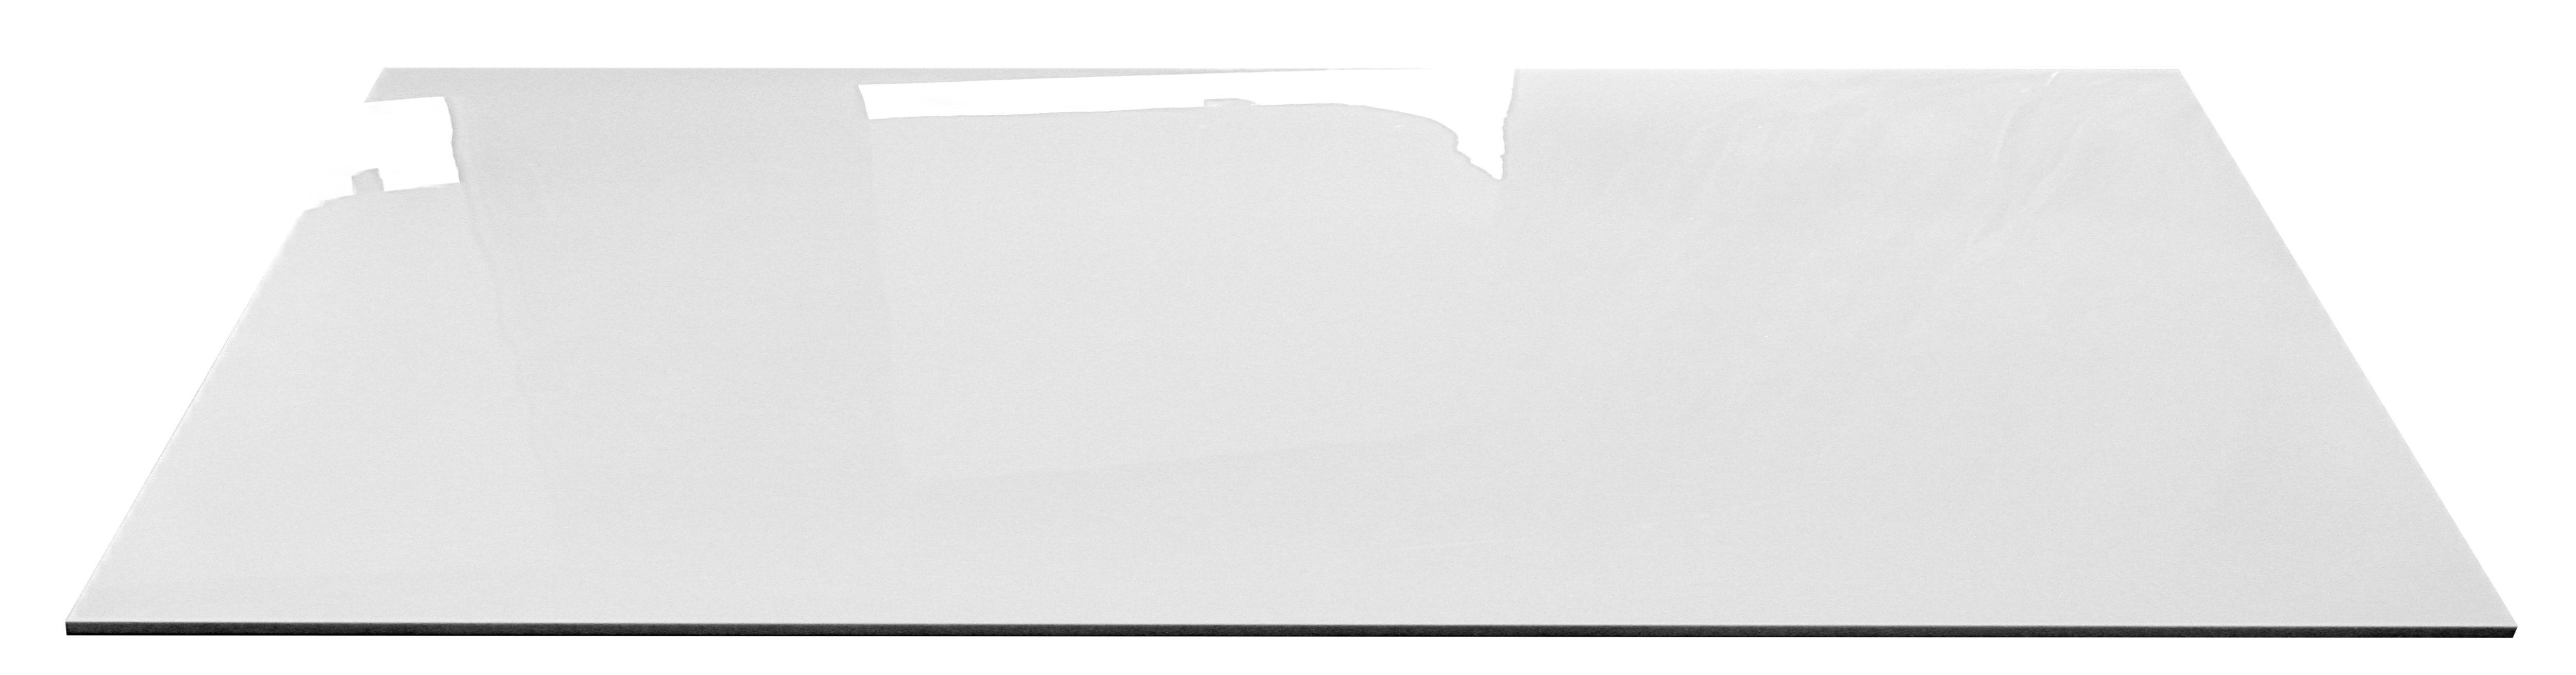 gres bia y polerowany 120 60 super white ceramstic gres polerowany kaflando. Black Bedroom Furniture Sets. Home Design Ideas